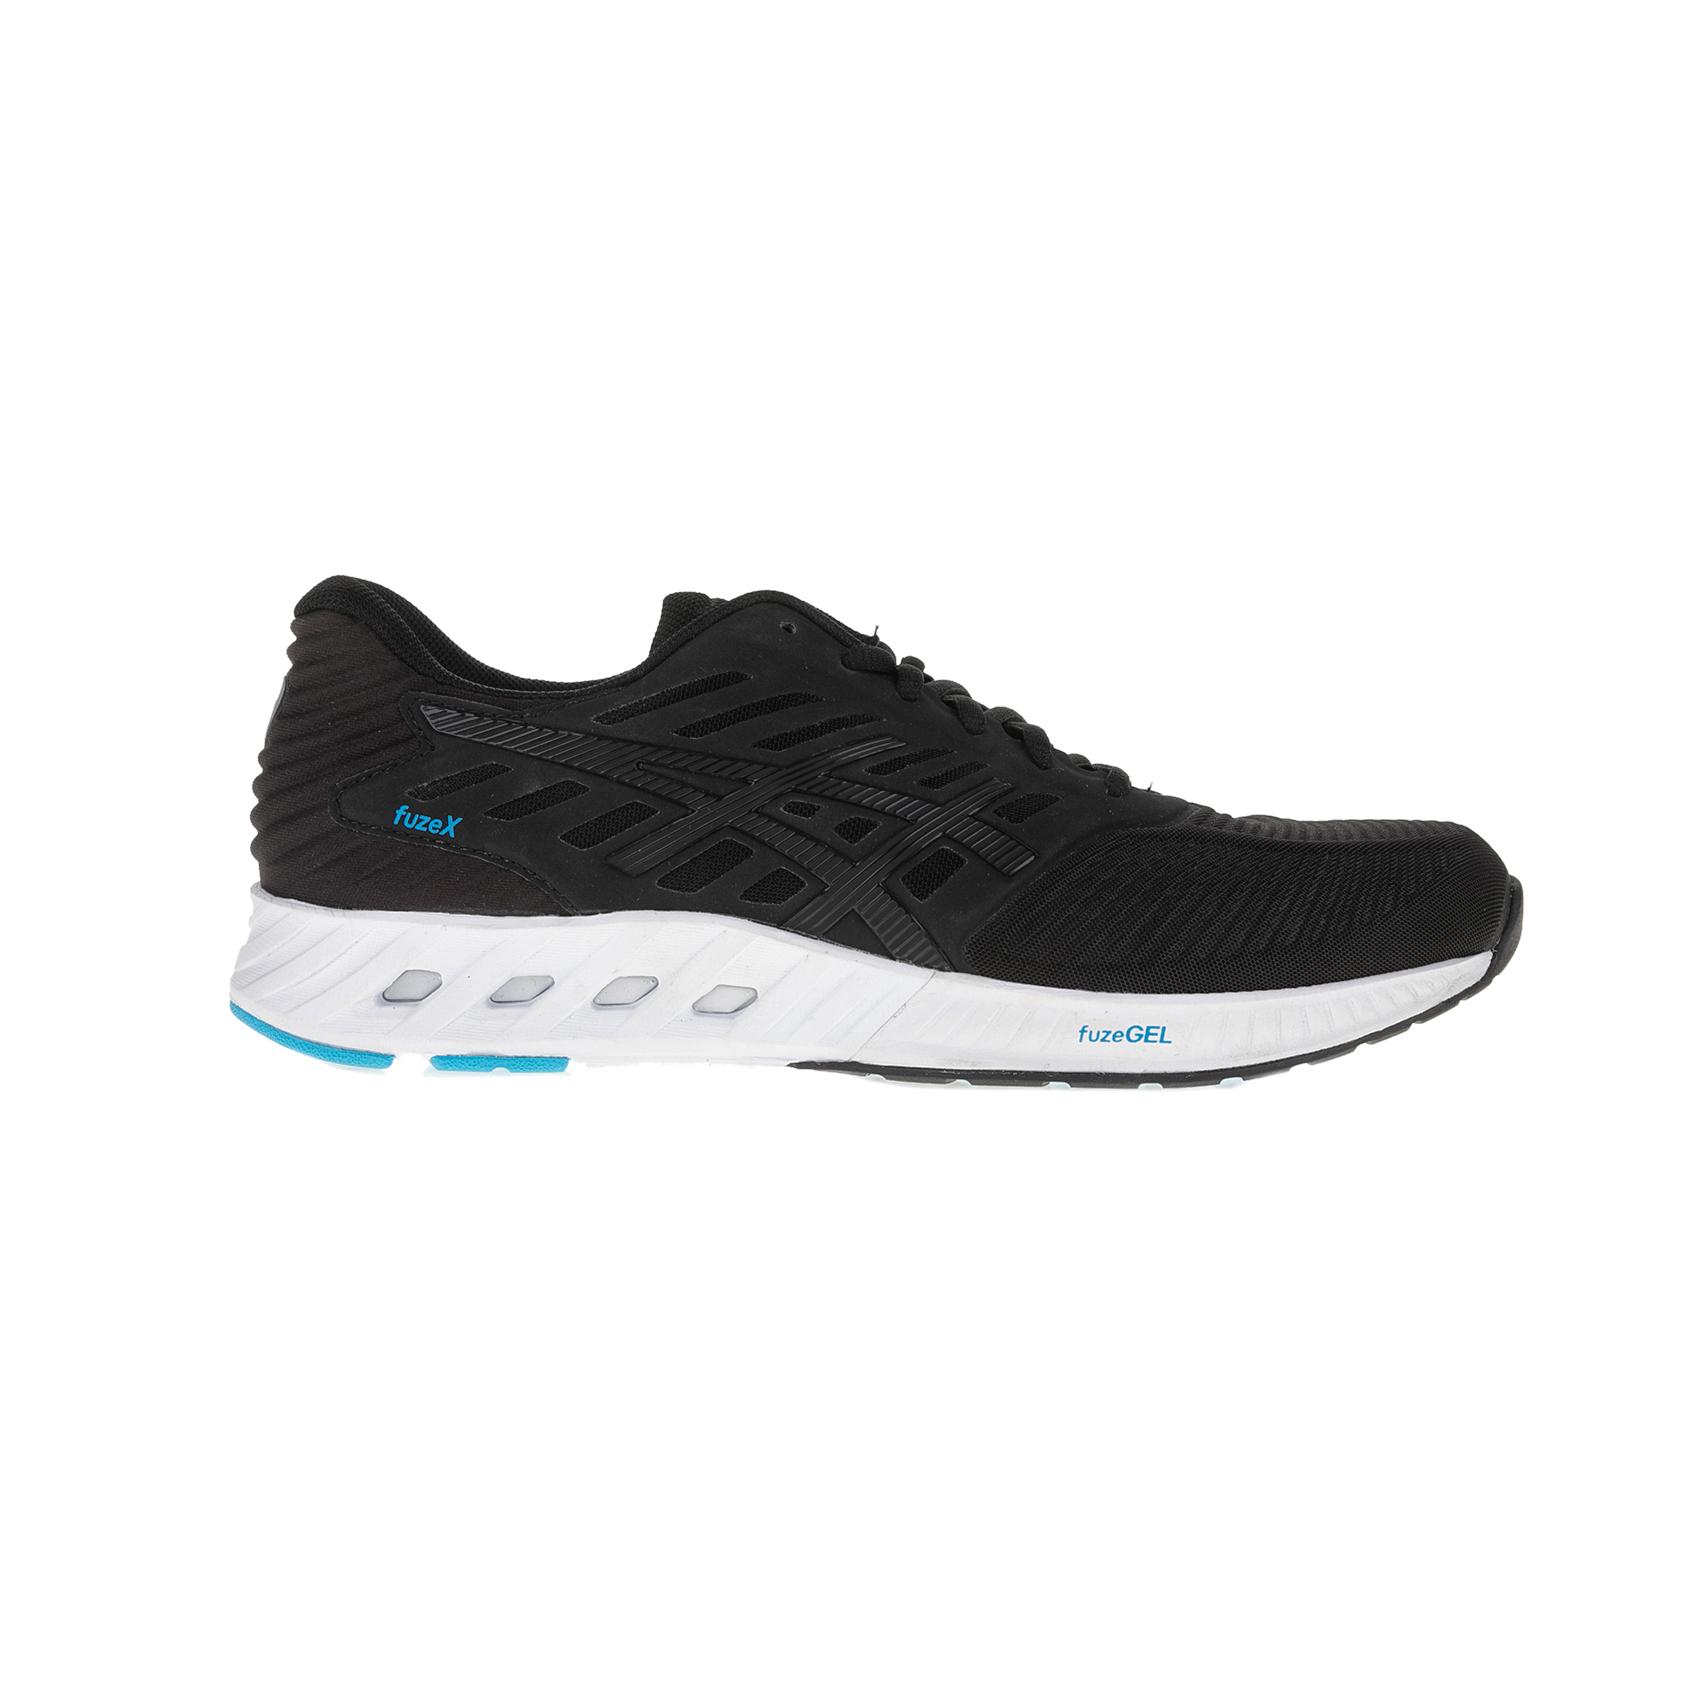 31ce4f8fbdc Ανδρικά Αθλητικά Παπούτσια για Τρέξιμο | e-Papoutsia.gr